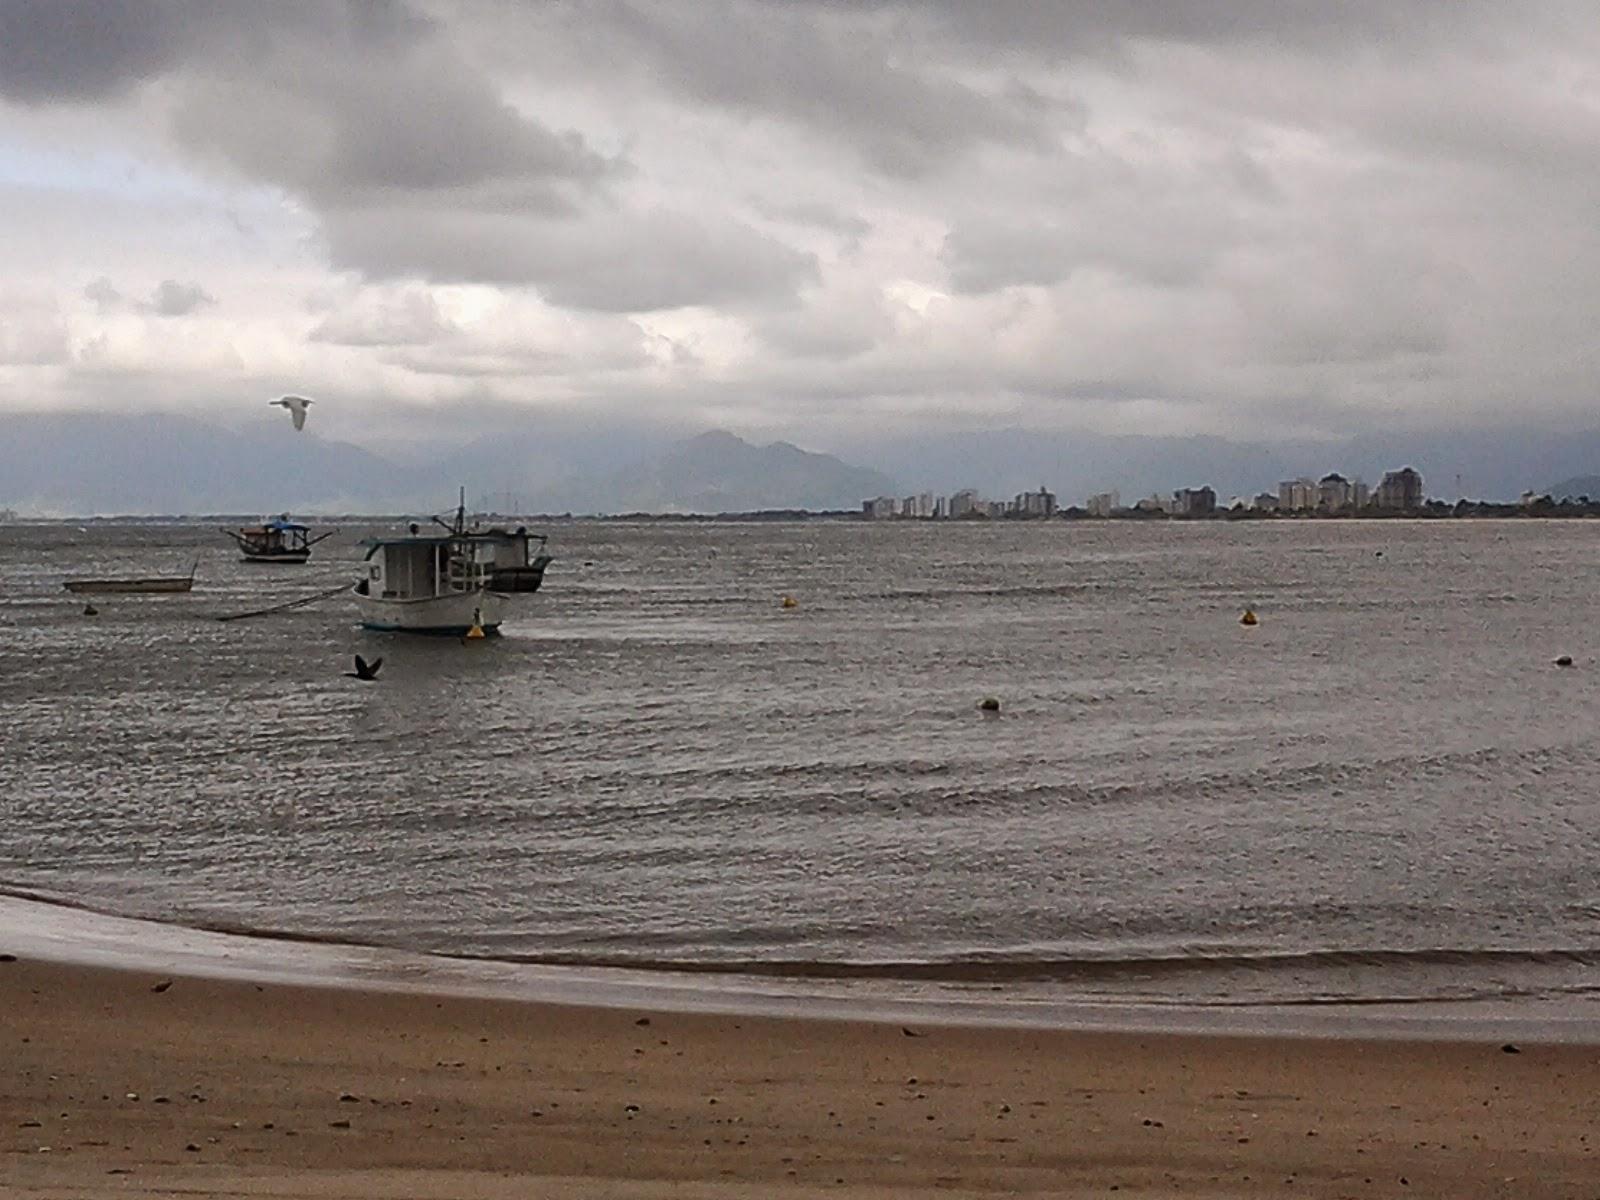 Foto tirada em Caraguatatuba